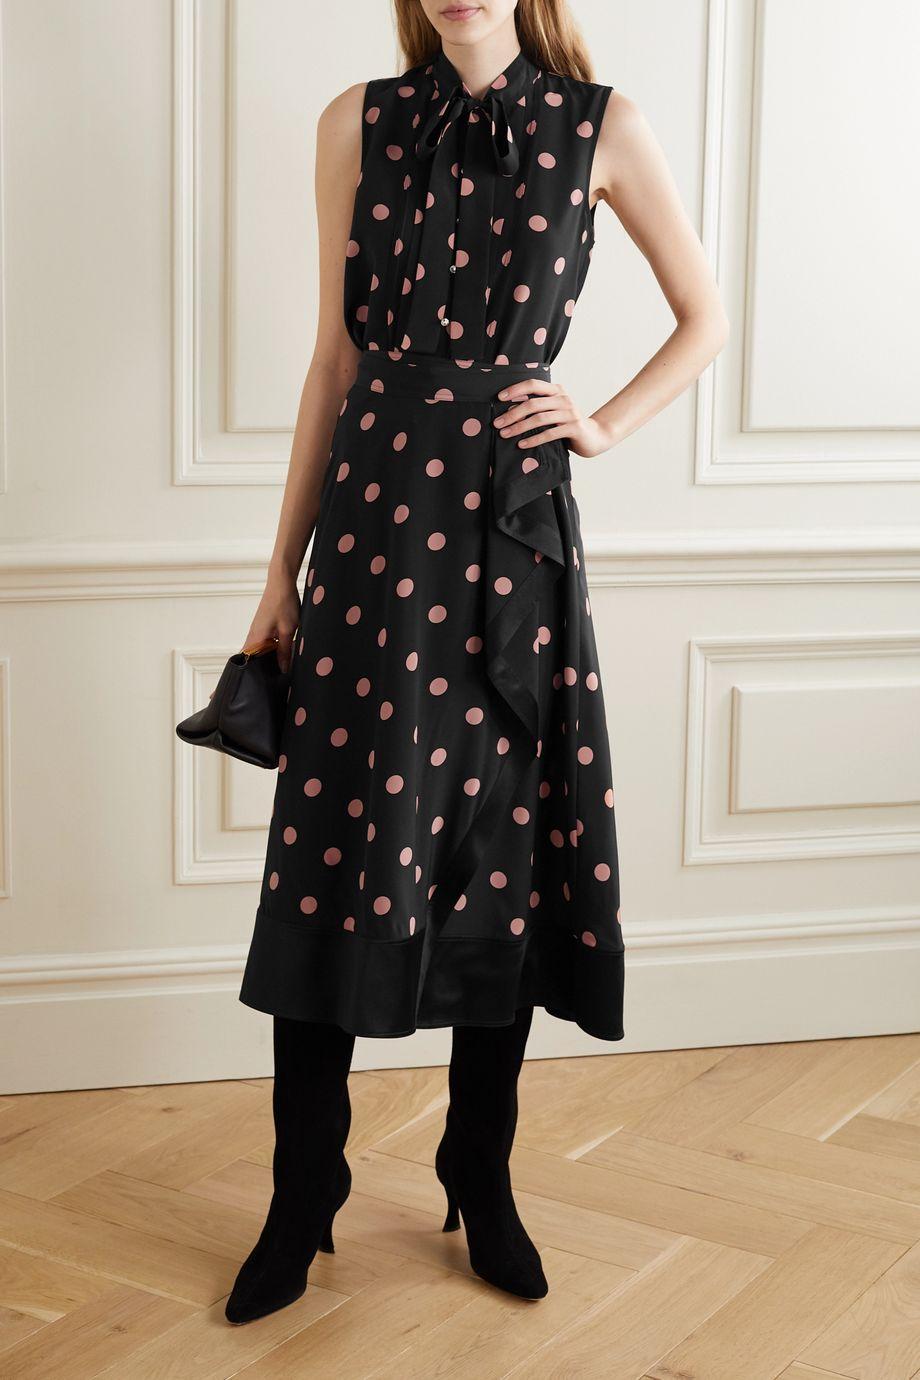 Tory Burch Crystal-embellished polka-dot silk-crepe top